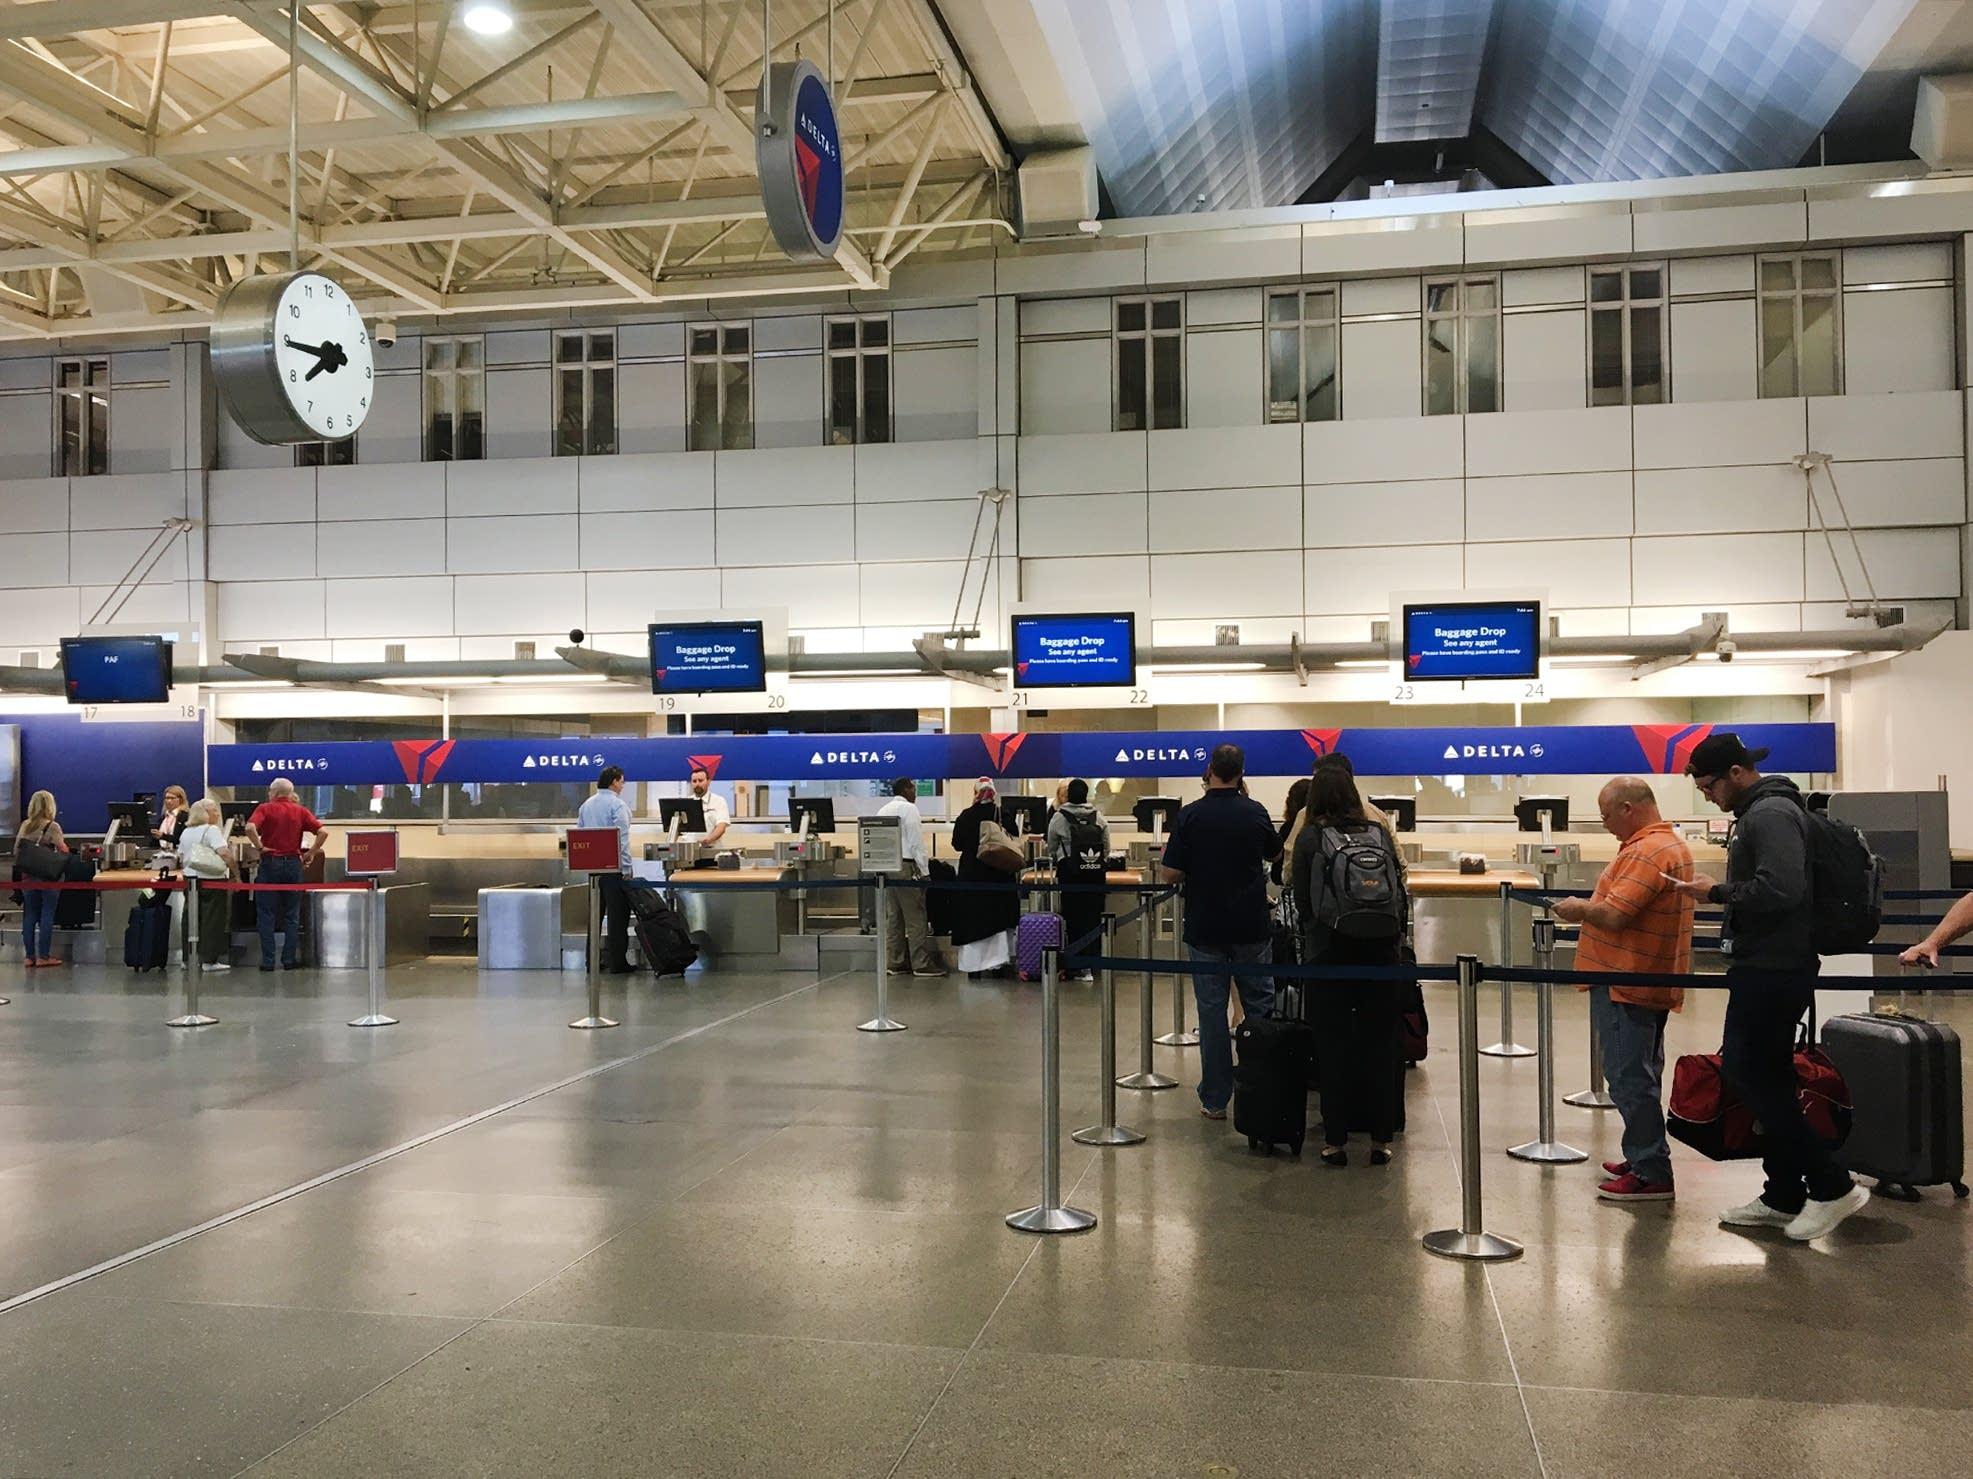 Delta customers wait in line